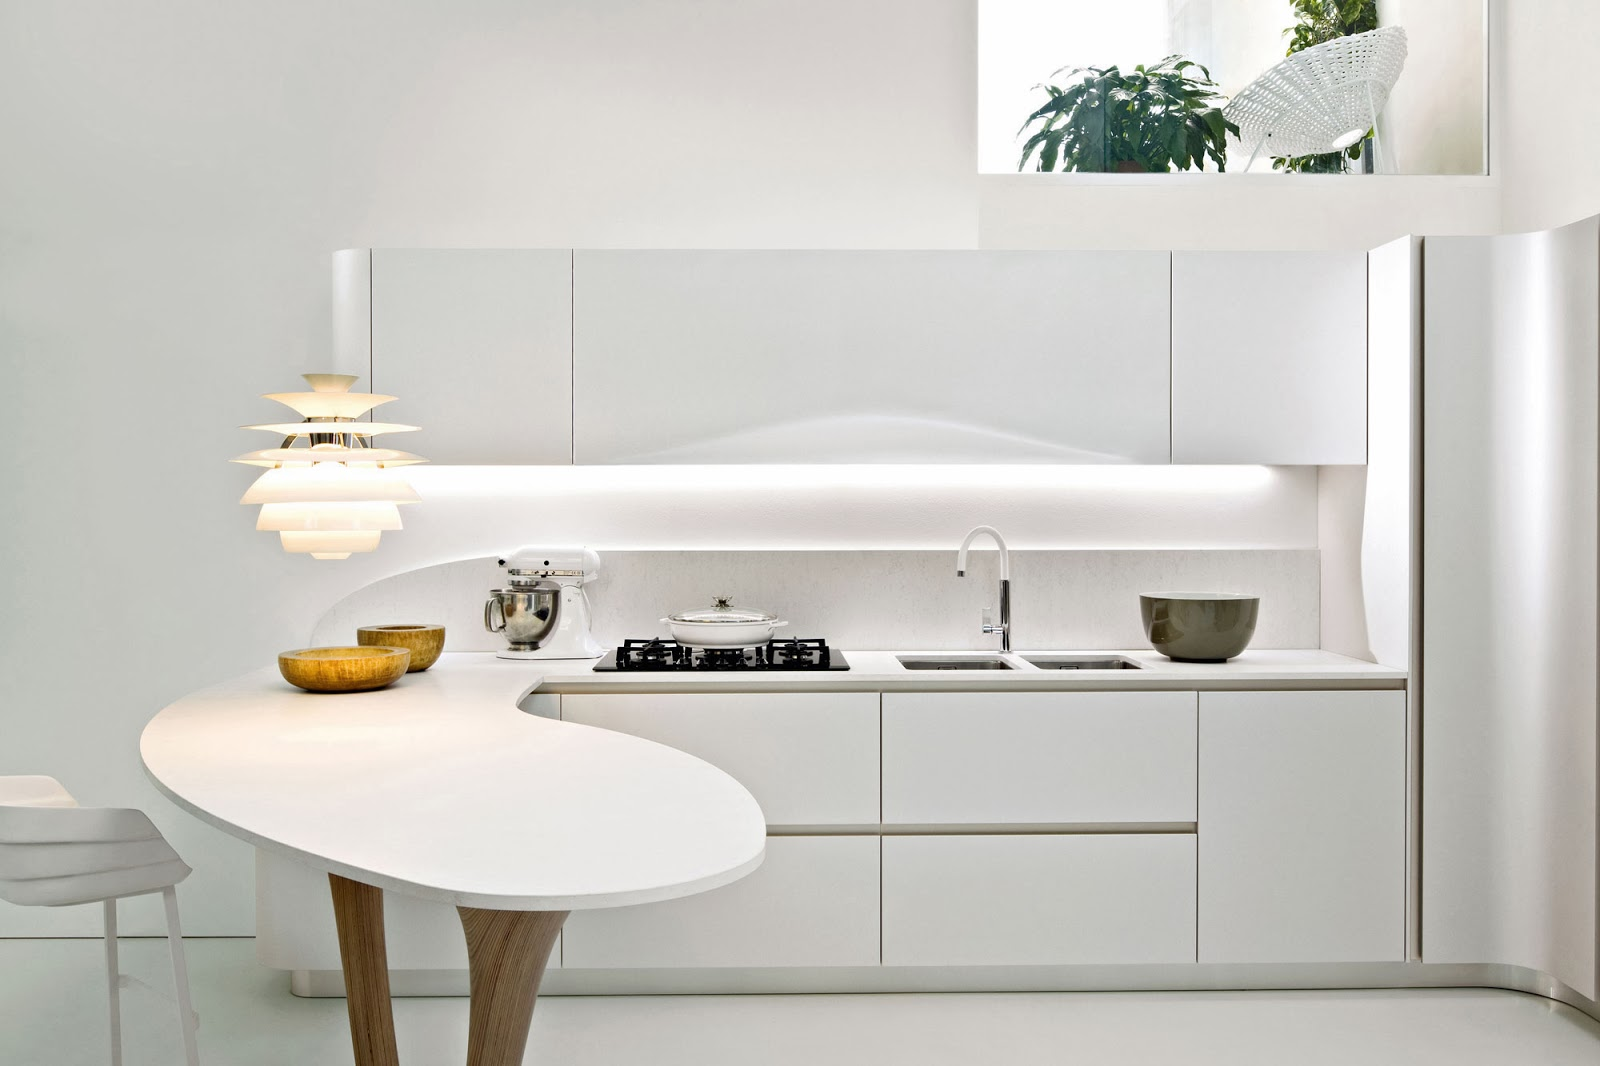 Cucine Moderne Le Migliori Soluzioni Per Arredare La Tua Cucina  #A97A22 1600 1066 Isole E Carrelli Di Cucina